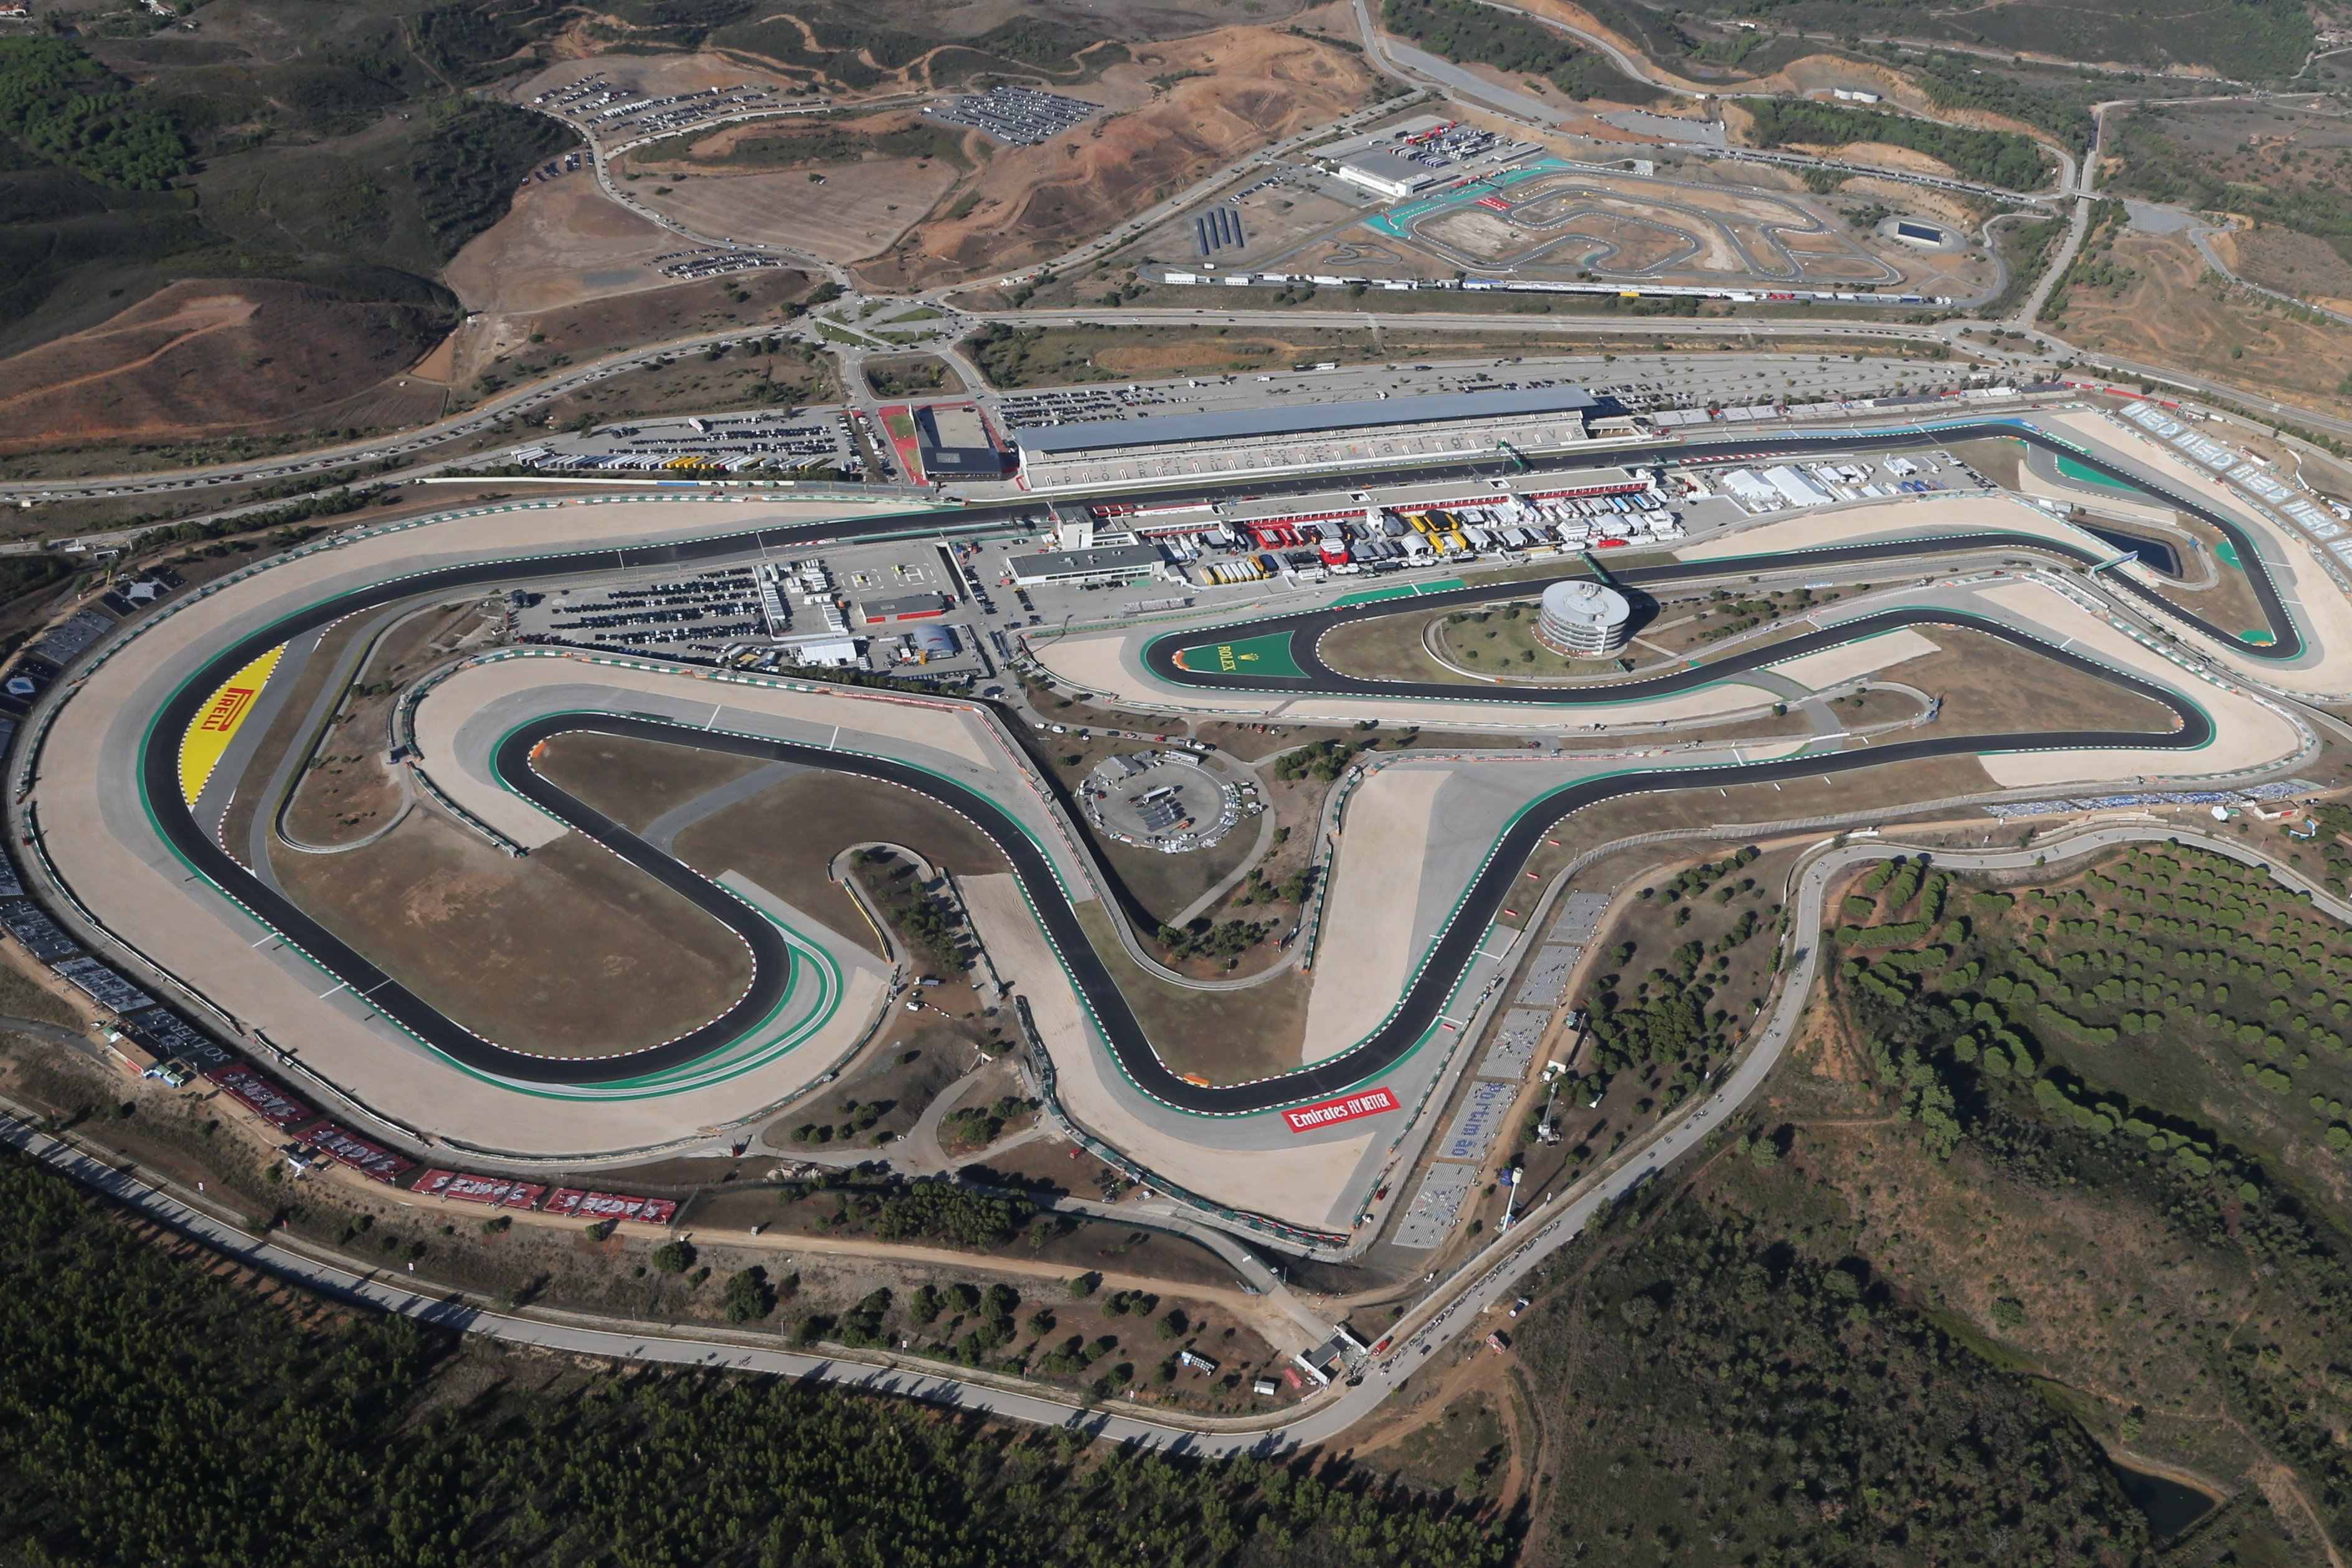 Хэмилтон или Ферстаппен: кто победит на Гран-при Португалии?